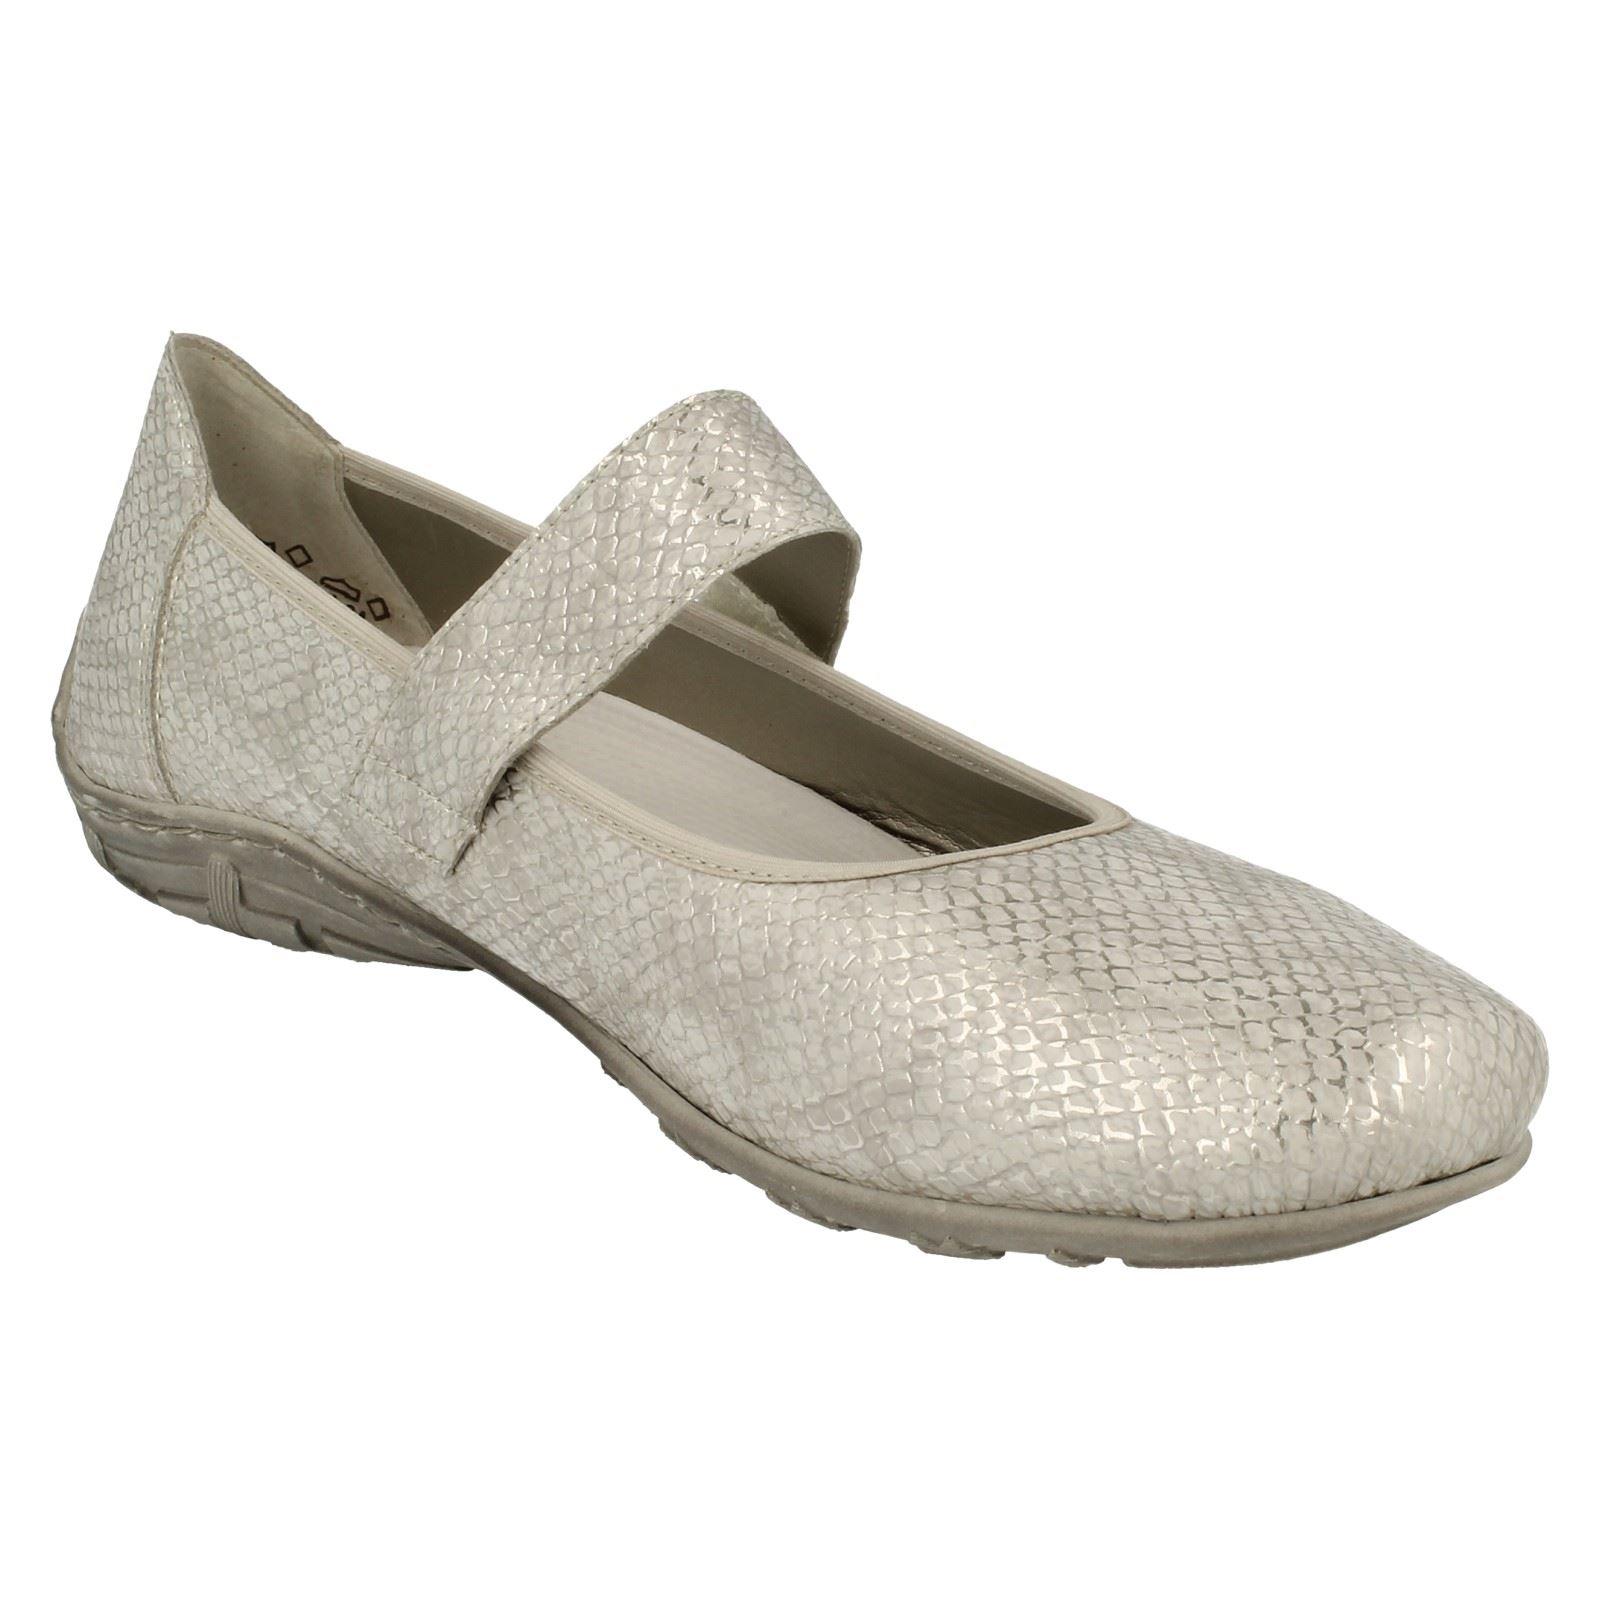 Damen Rieker Mary - Jane-Stil Schuhe - Mary L2062 817dc2